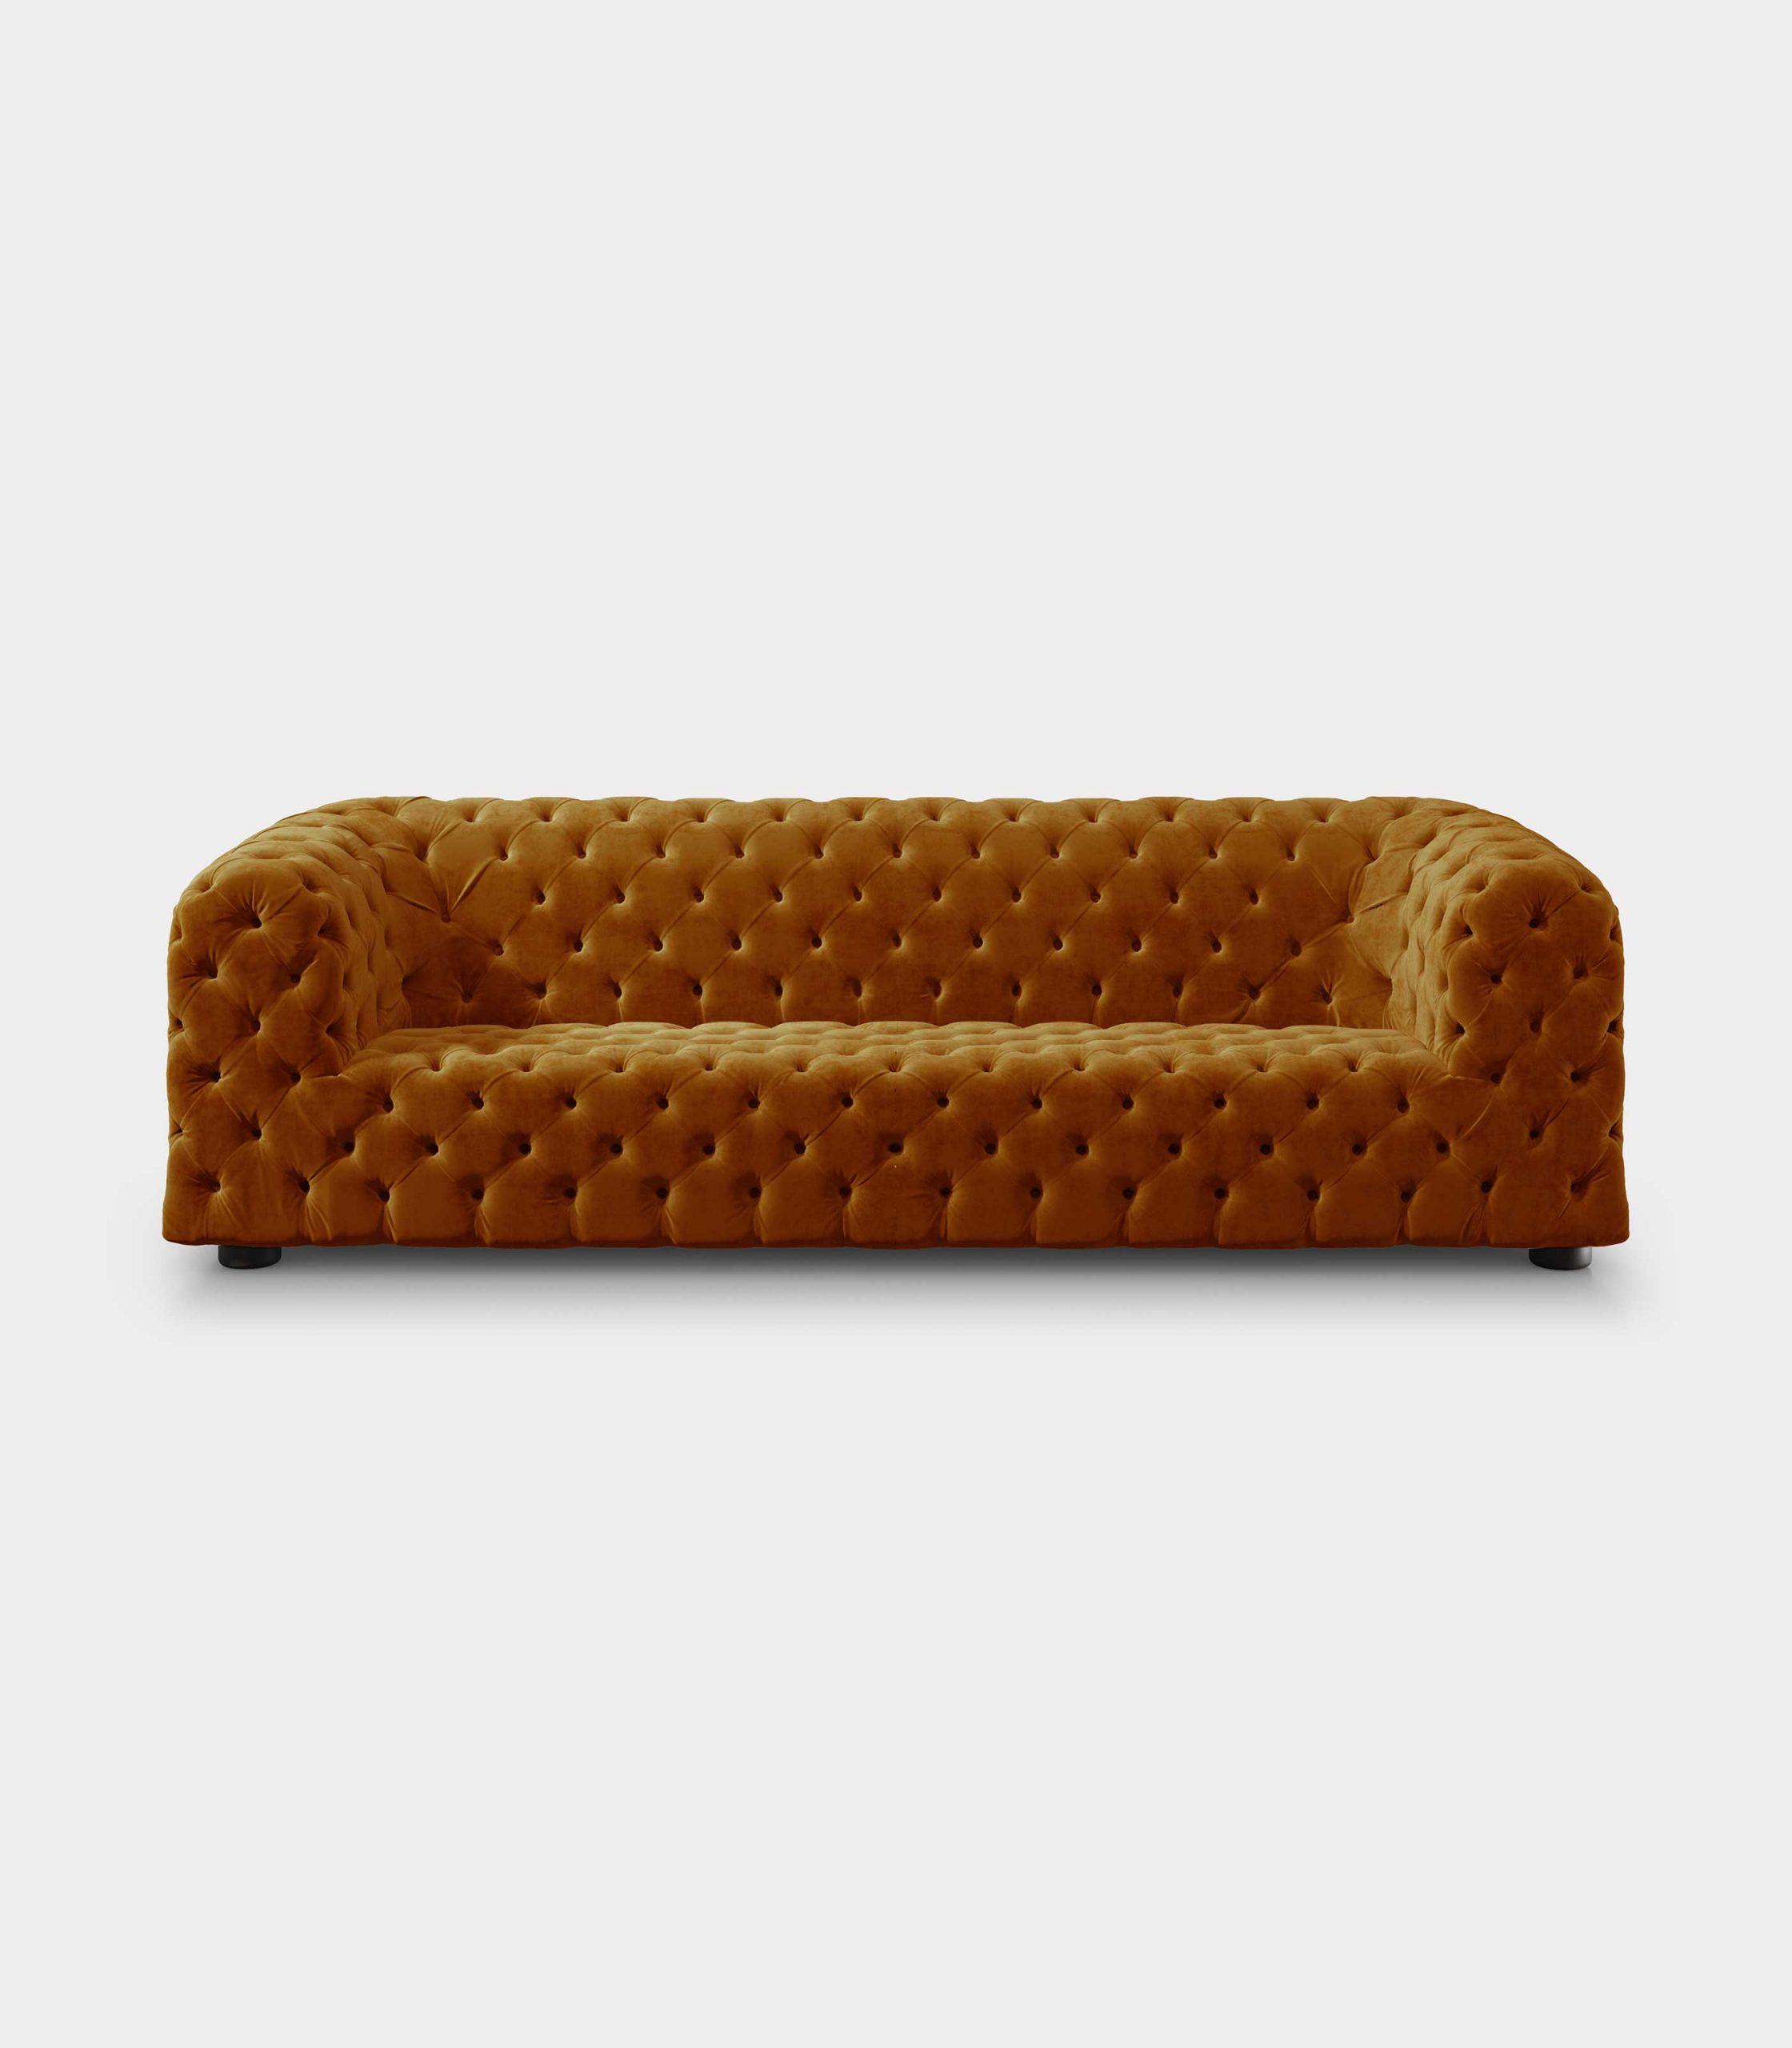 Capitonné mustard velvet sofa loopo milan design F